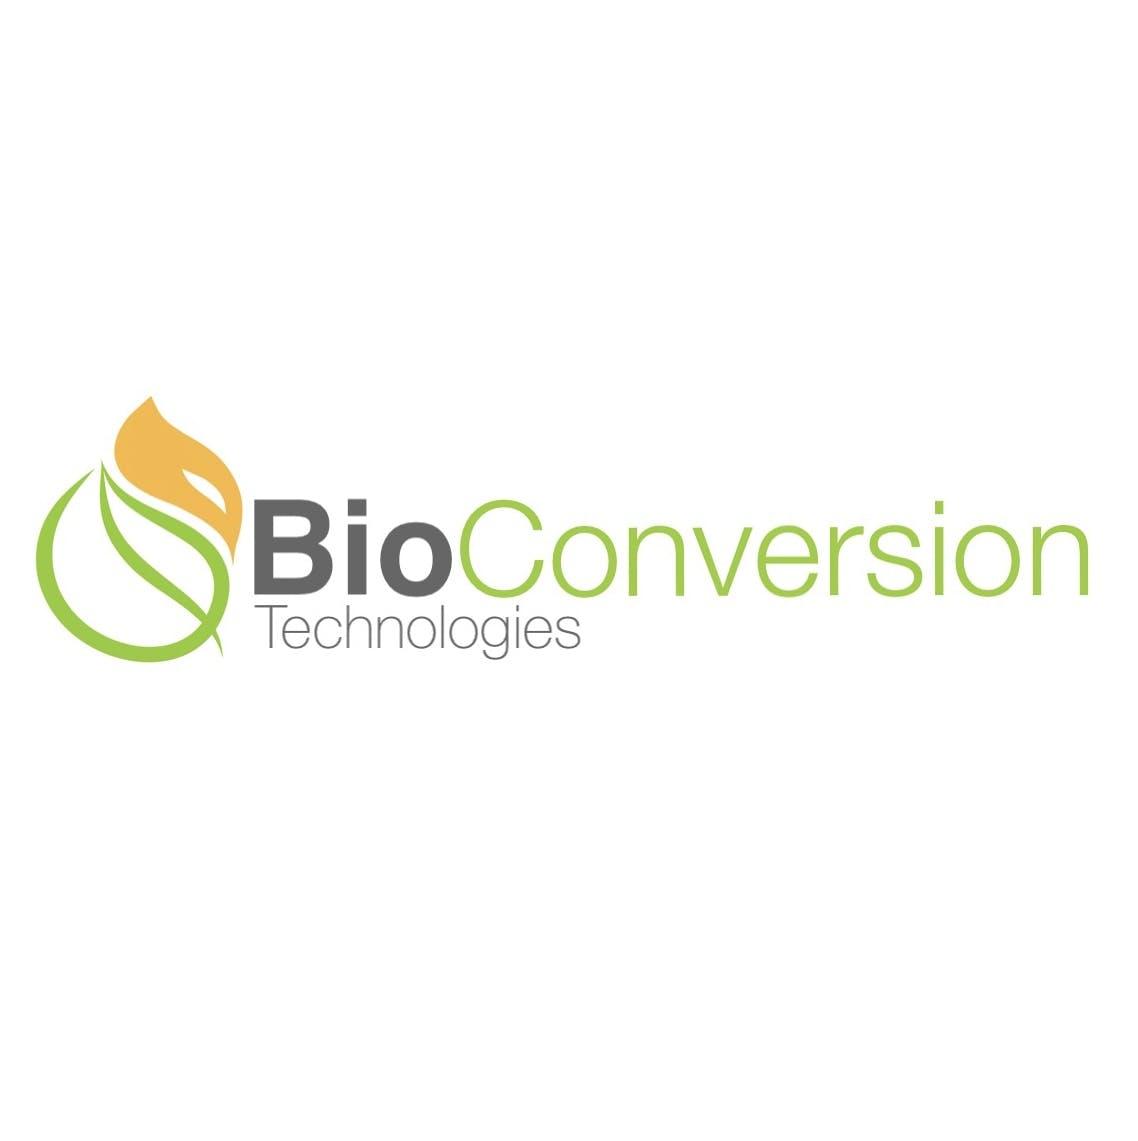 Bioconversion Technologies